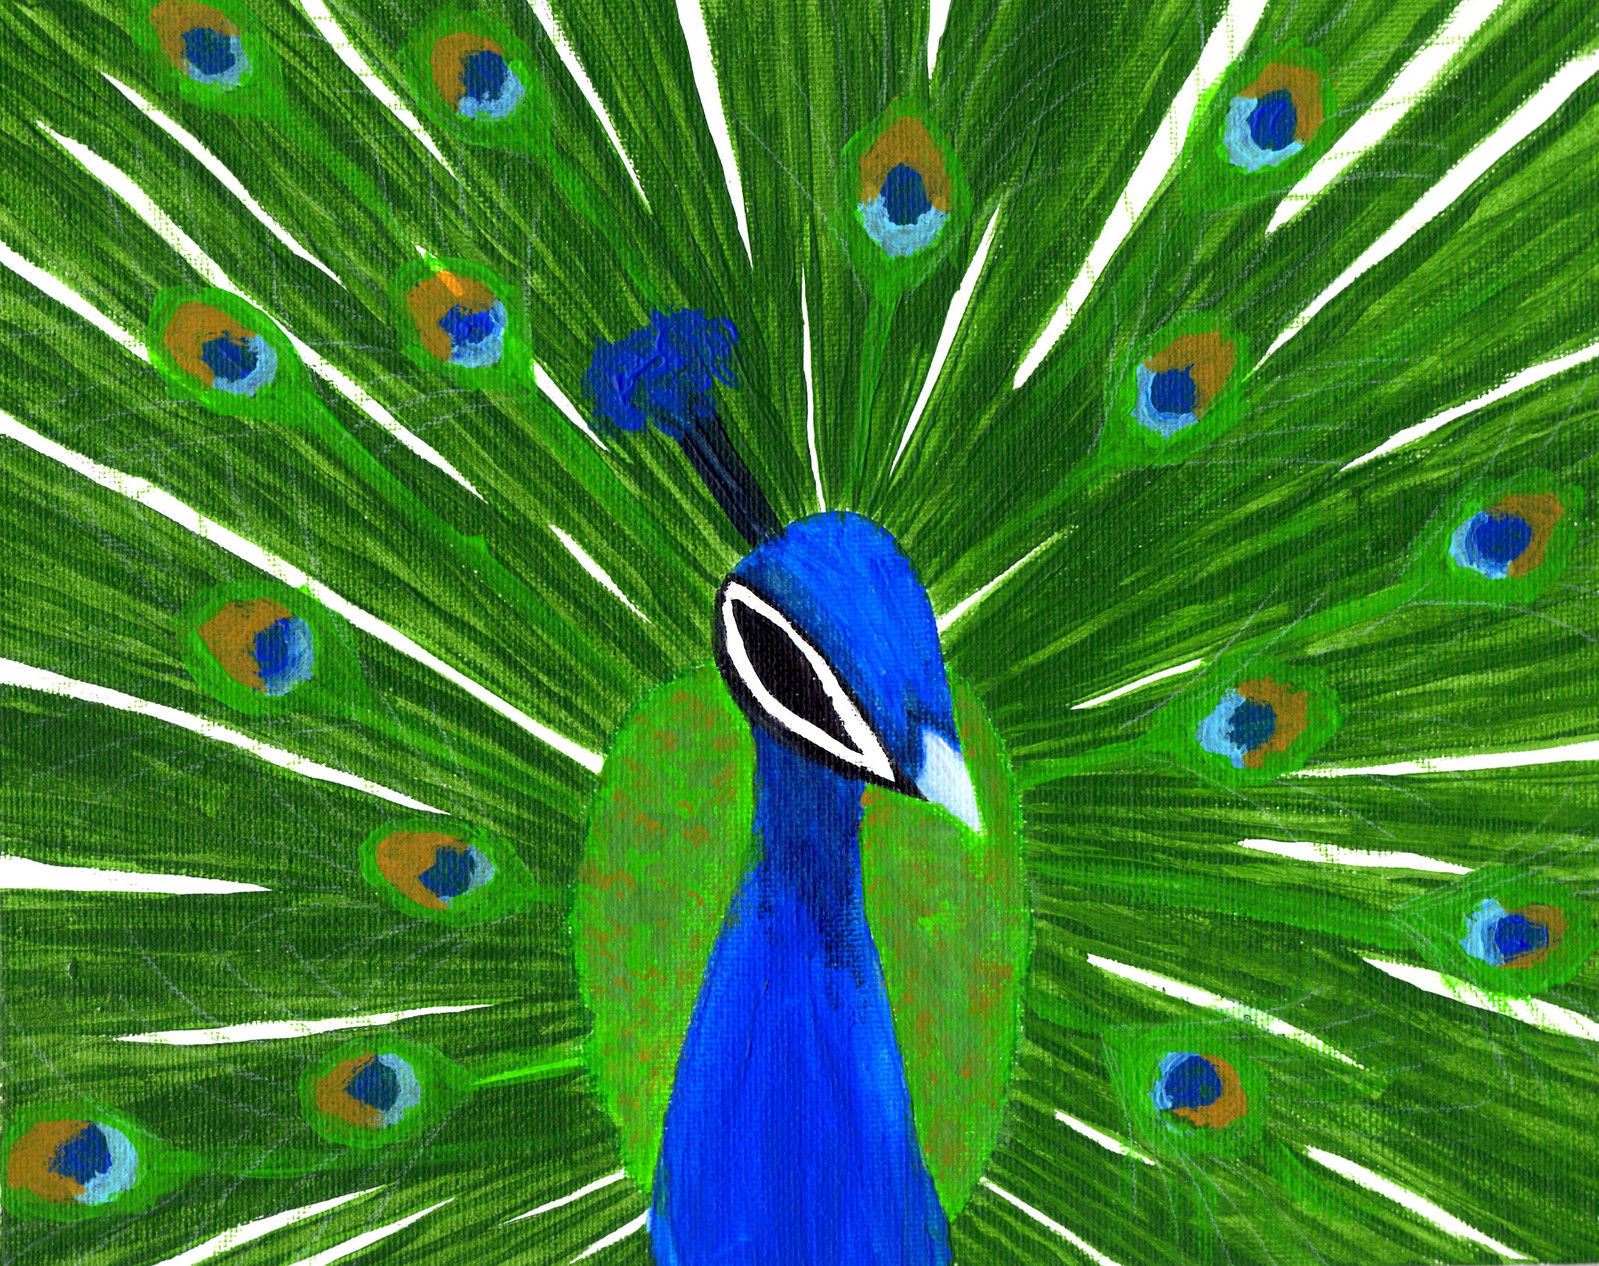 peacock essay in marathi